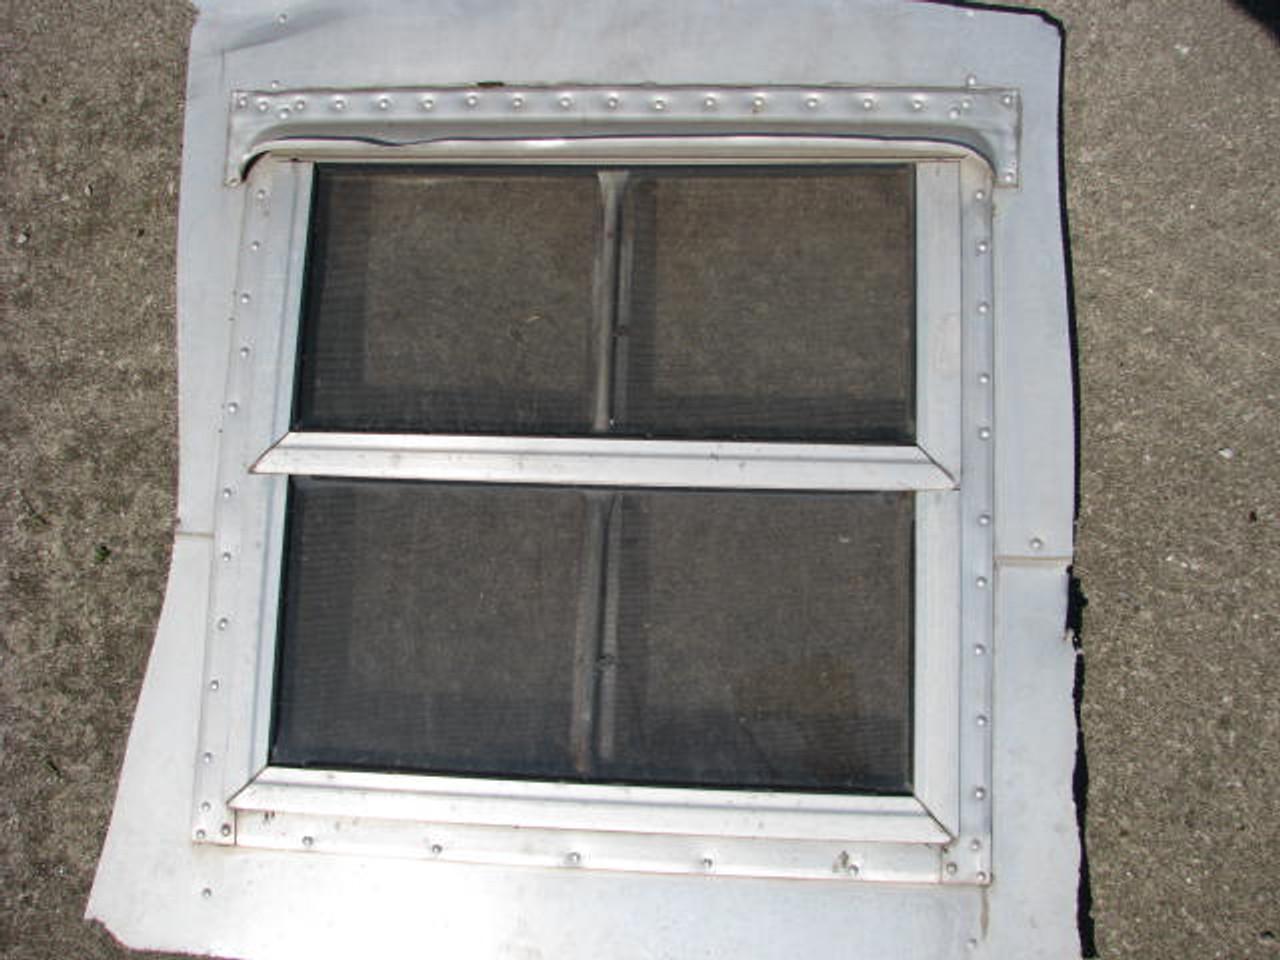 18in. x 18in. R.O. Air-o-lite window (BP325)